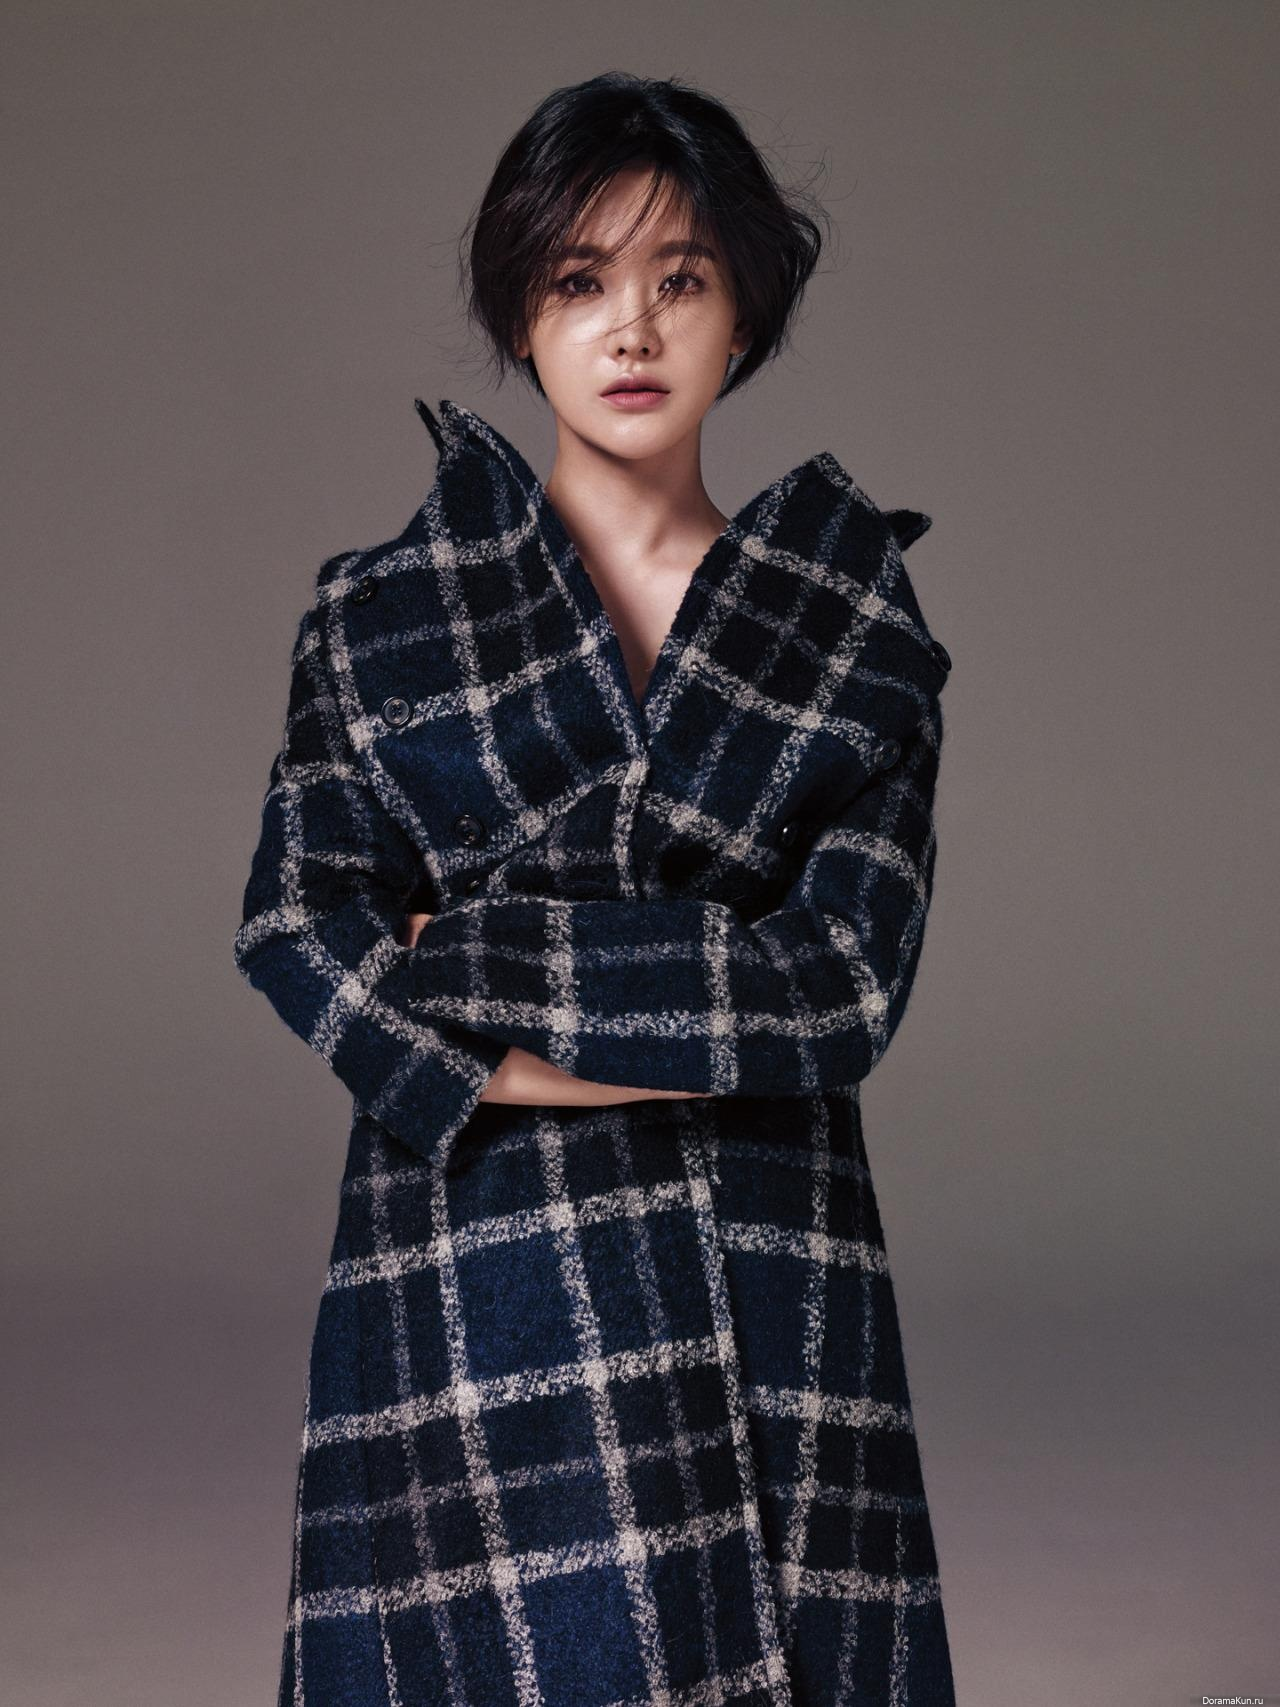 Oh-Yeon-Seo06-1280.jpg